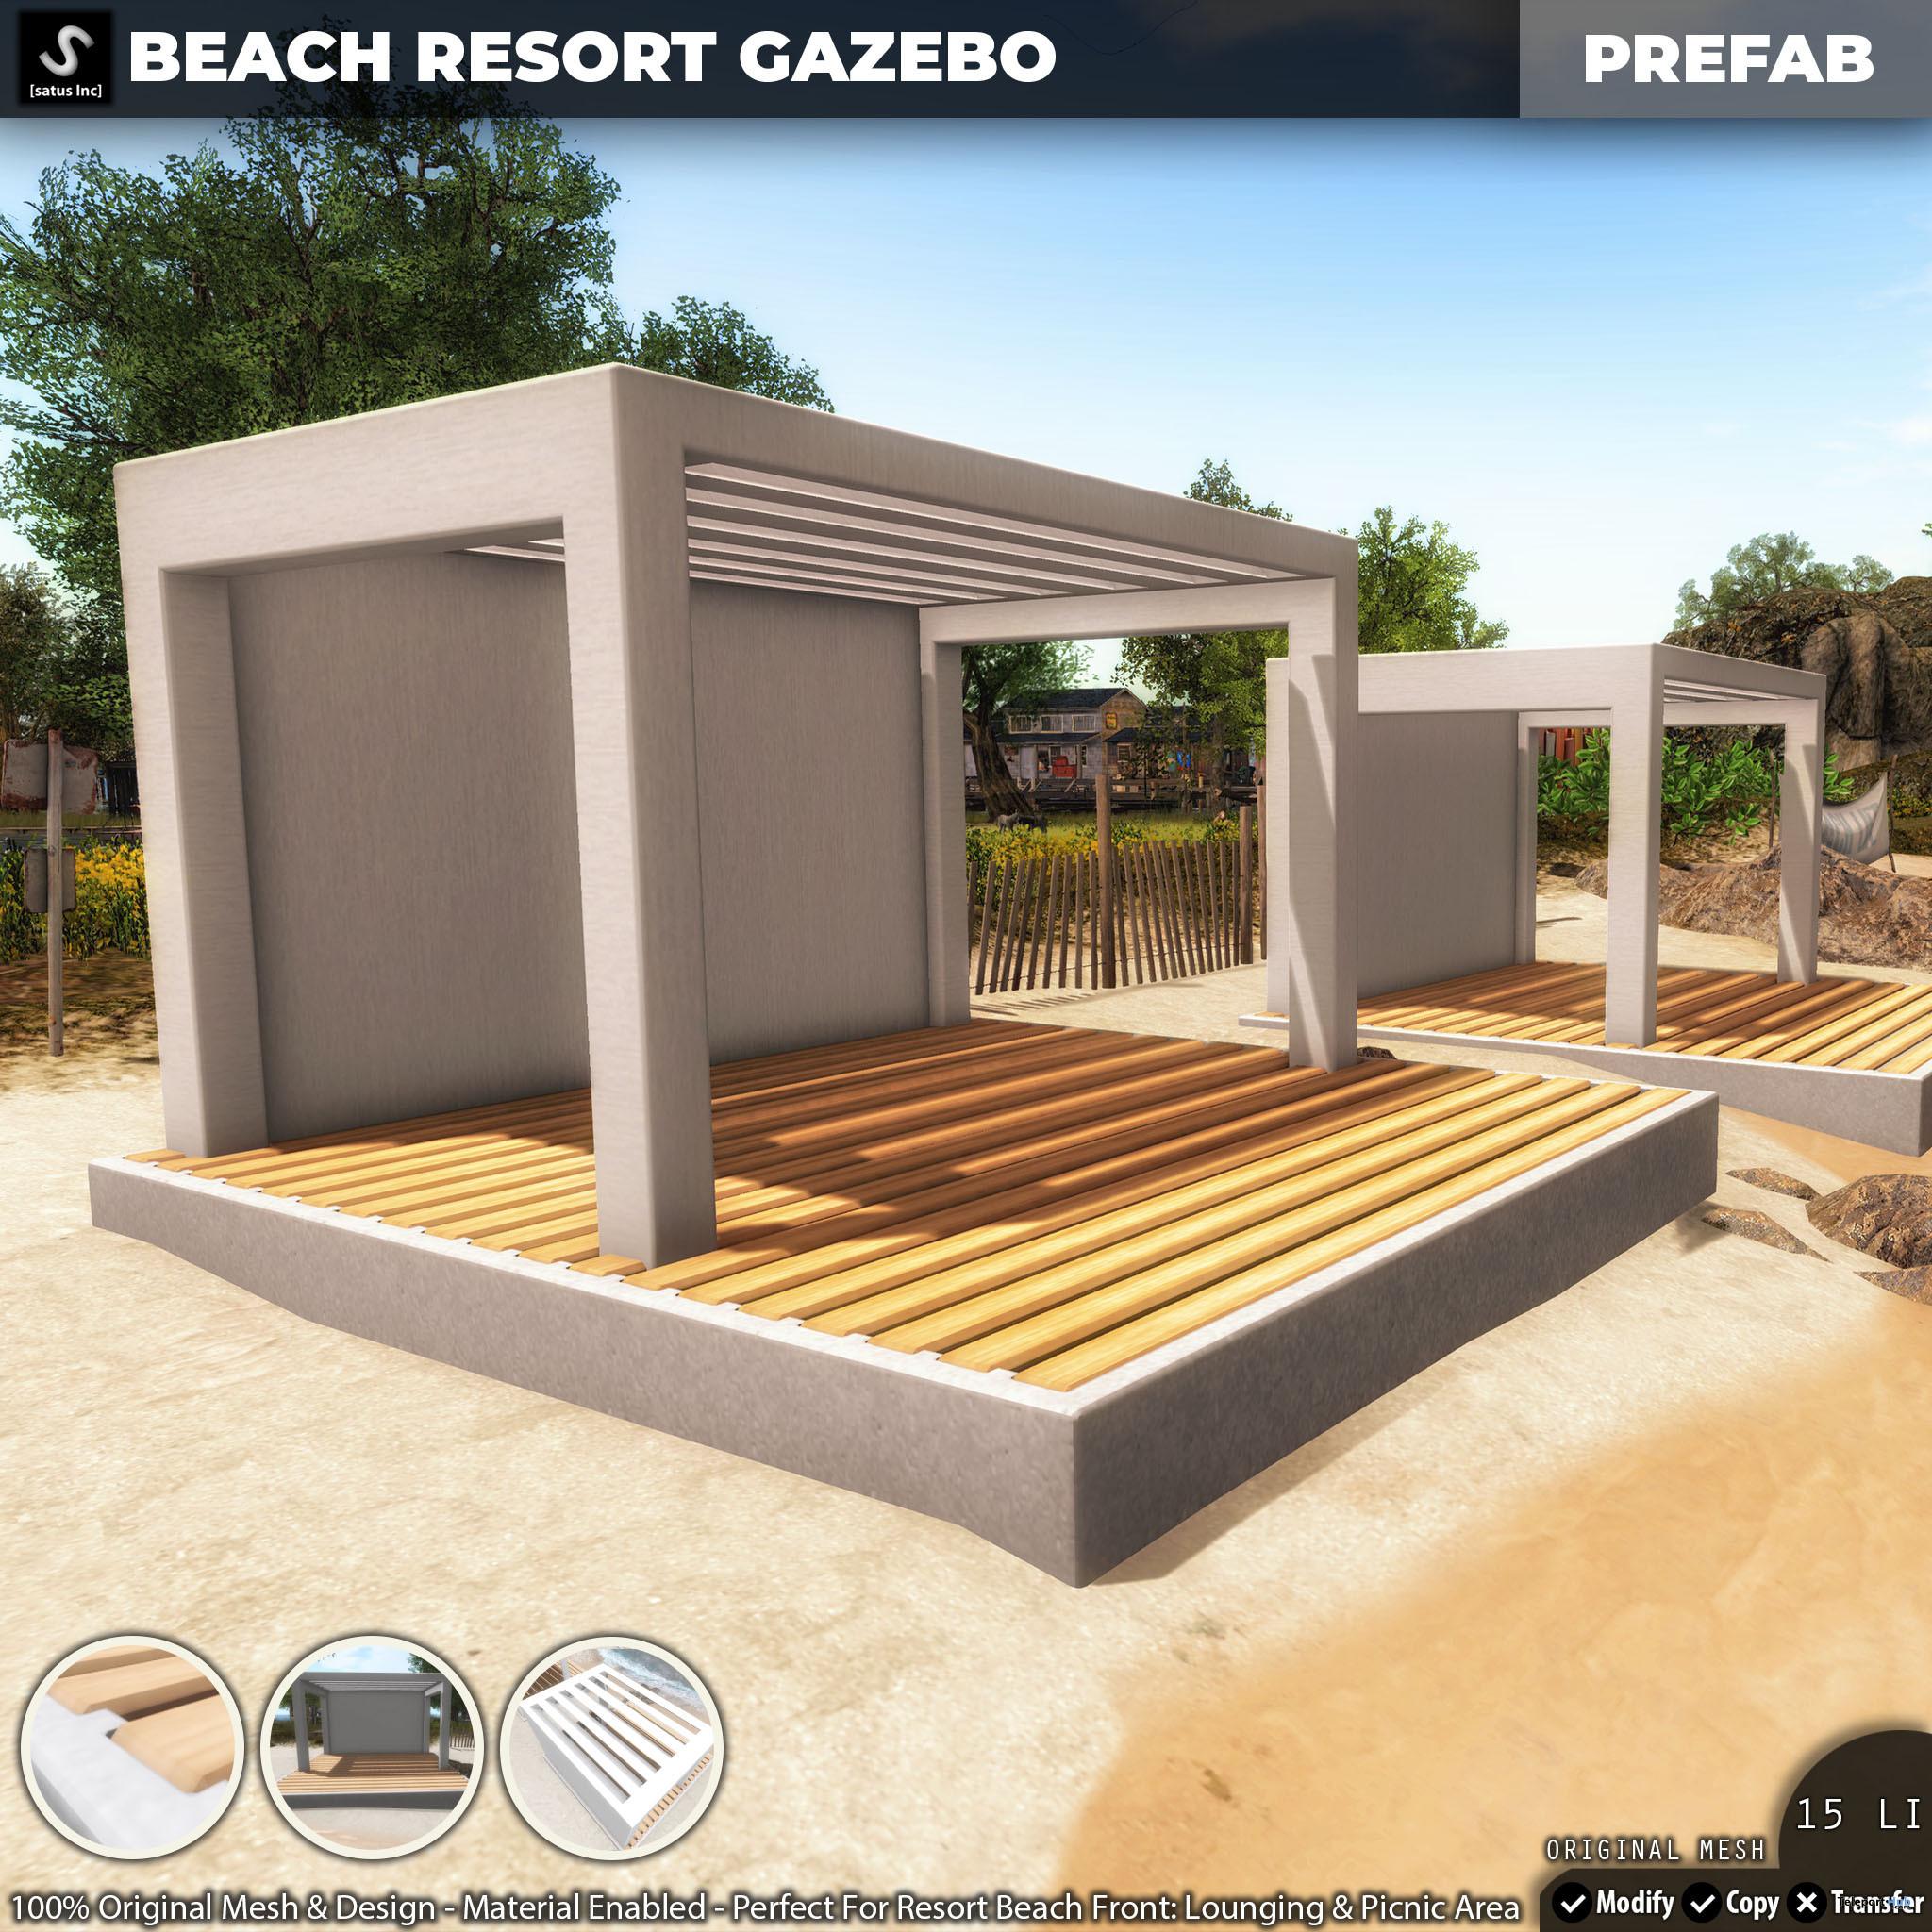 New Release: Beach Resort Gazebo by [satus Inc] - Teleport Hub - teleporthub.com